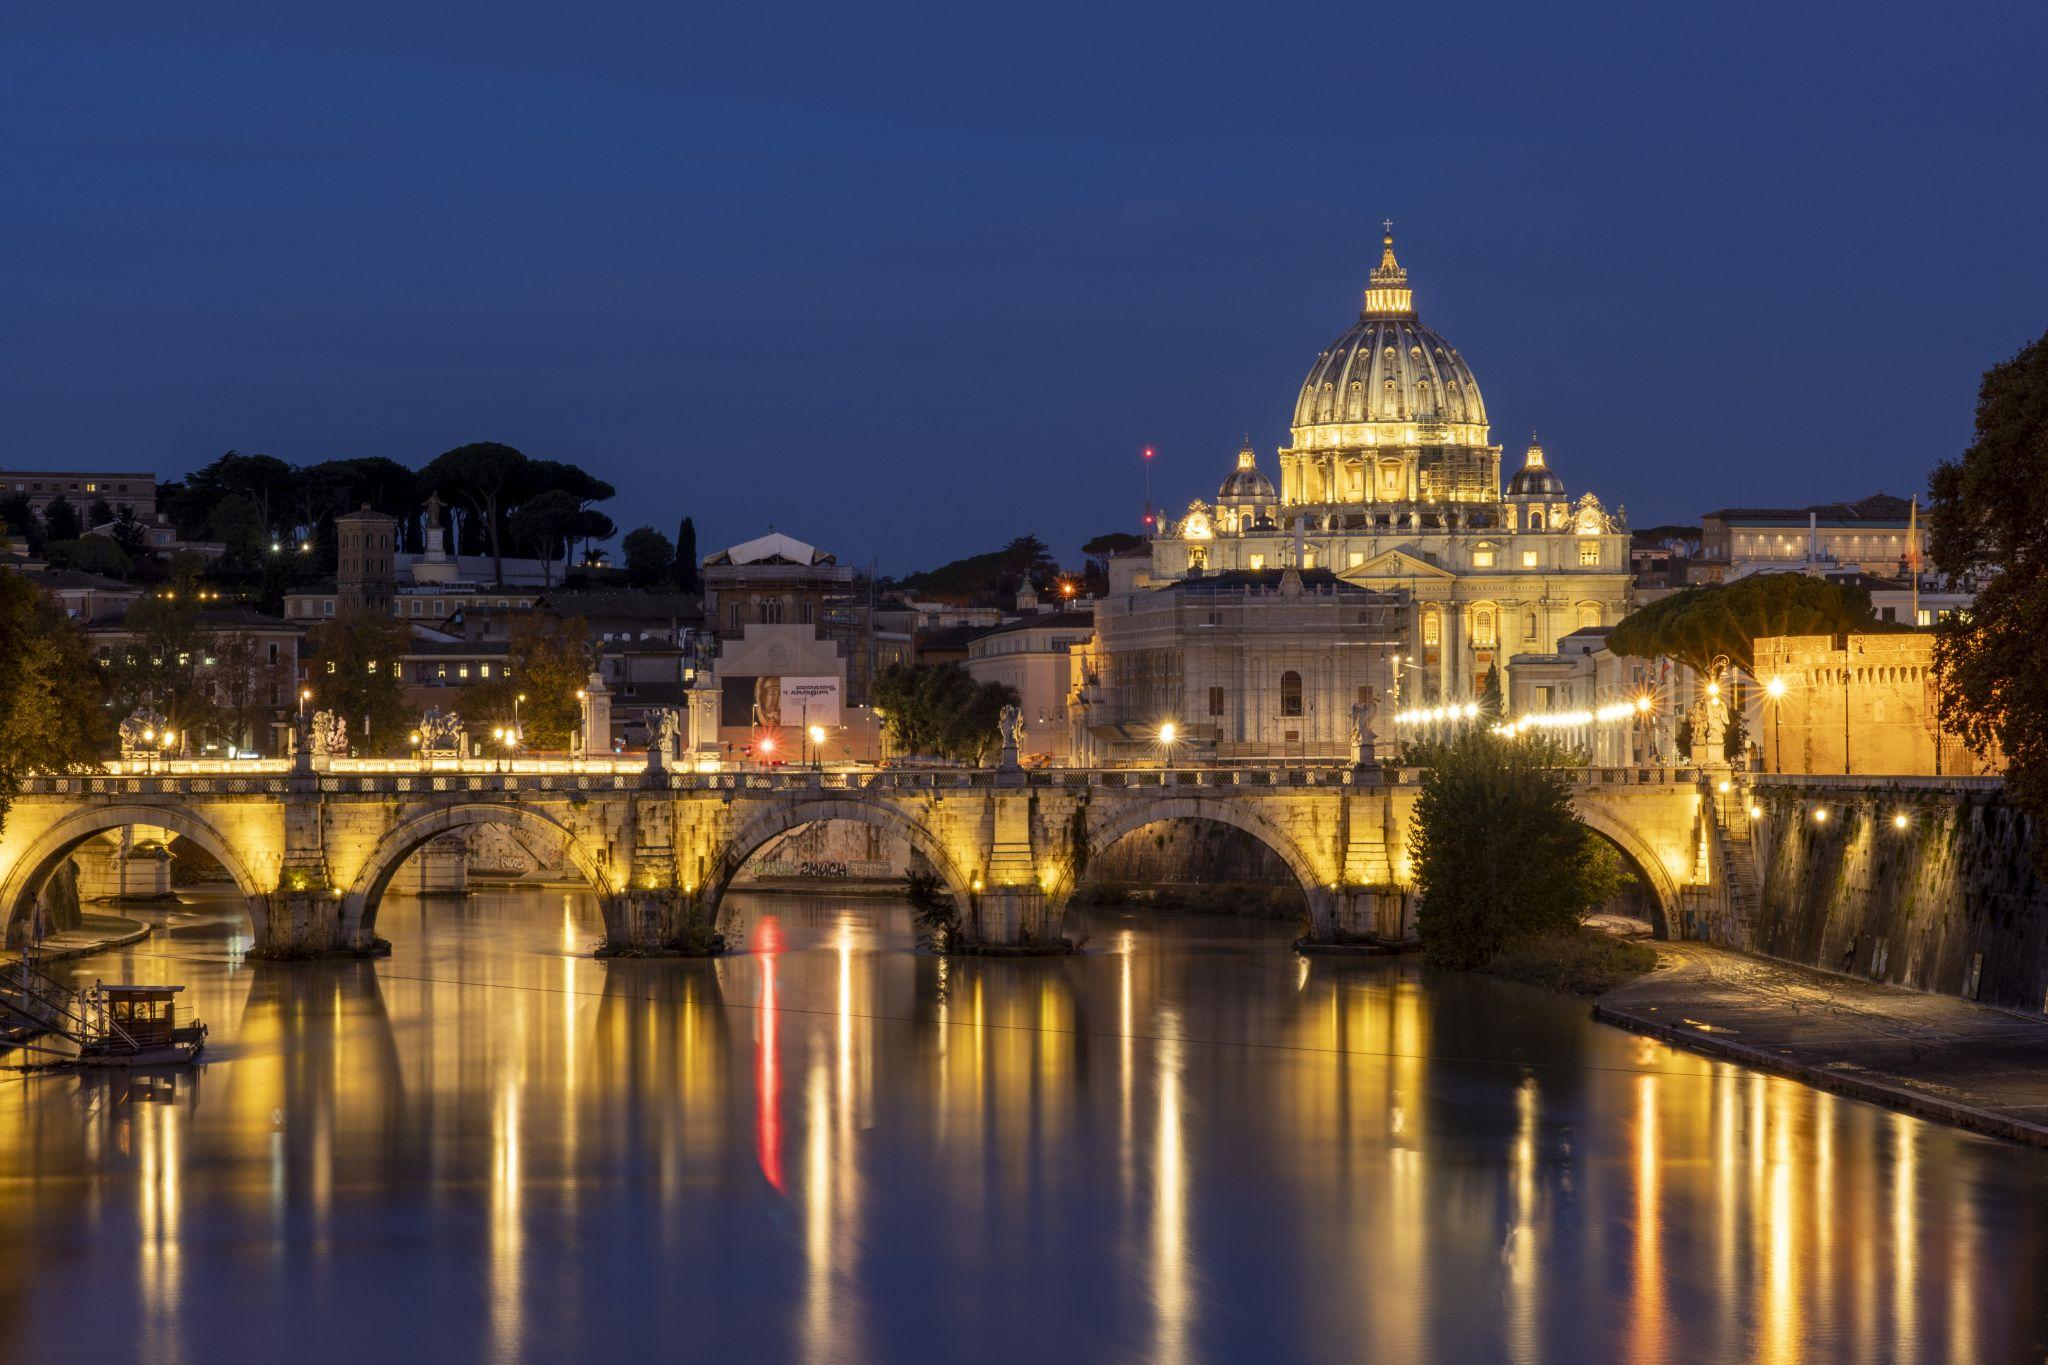 Saint Peter's Basilica, Italy